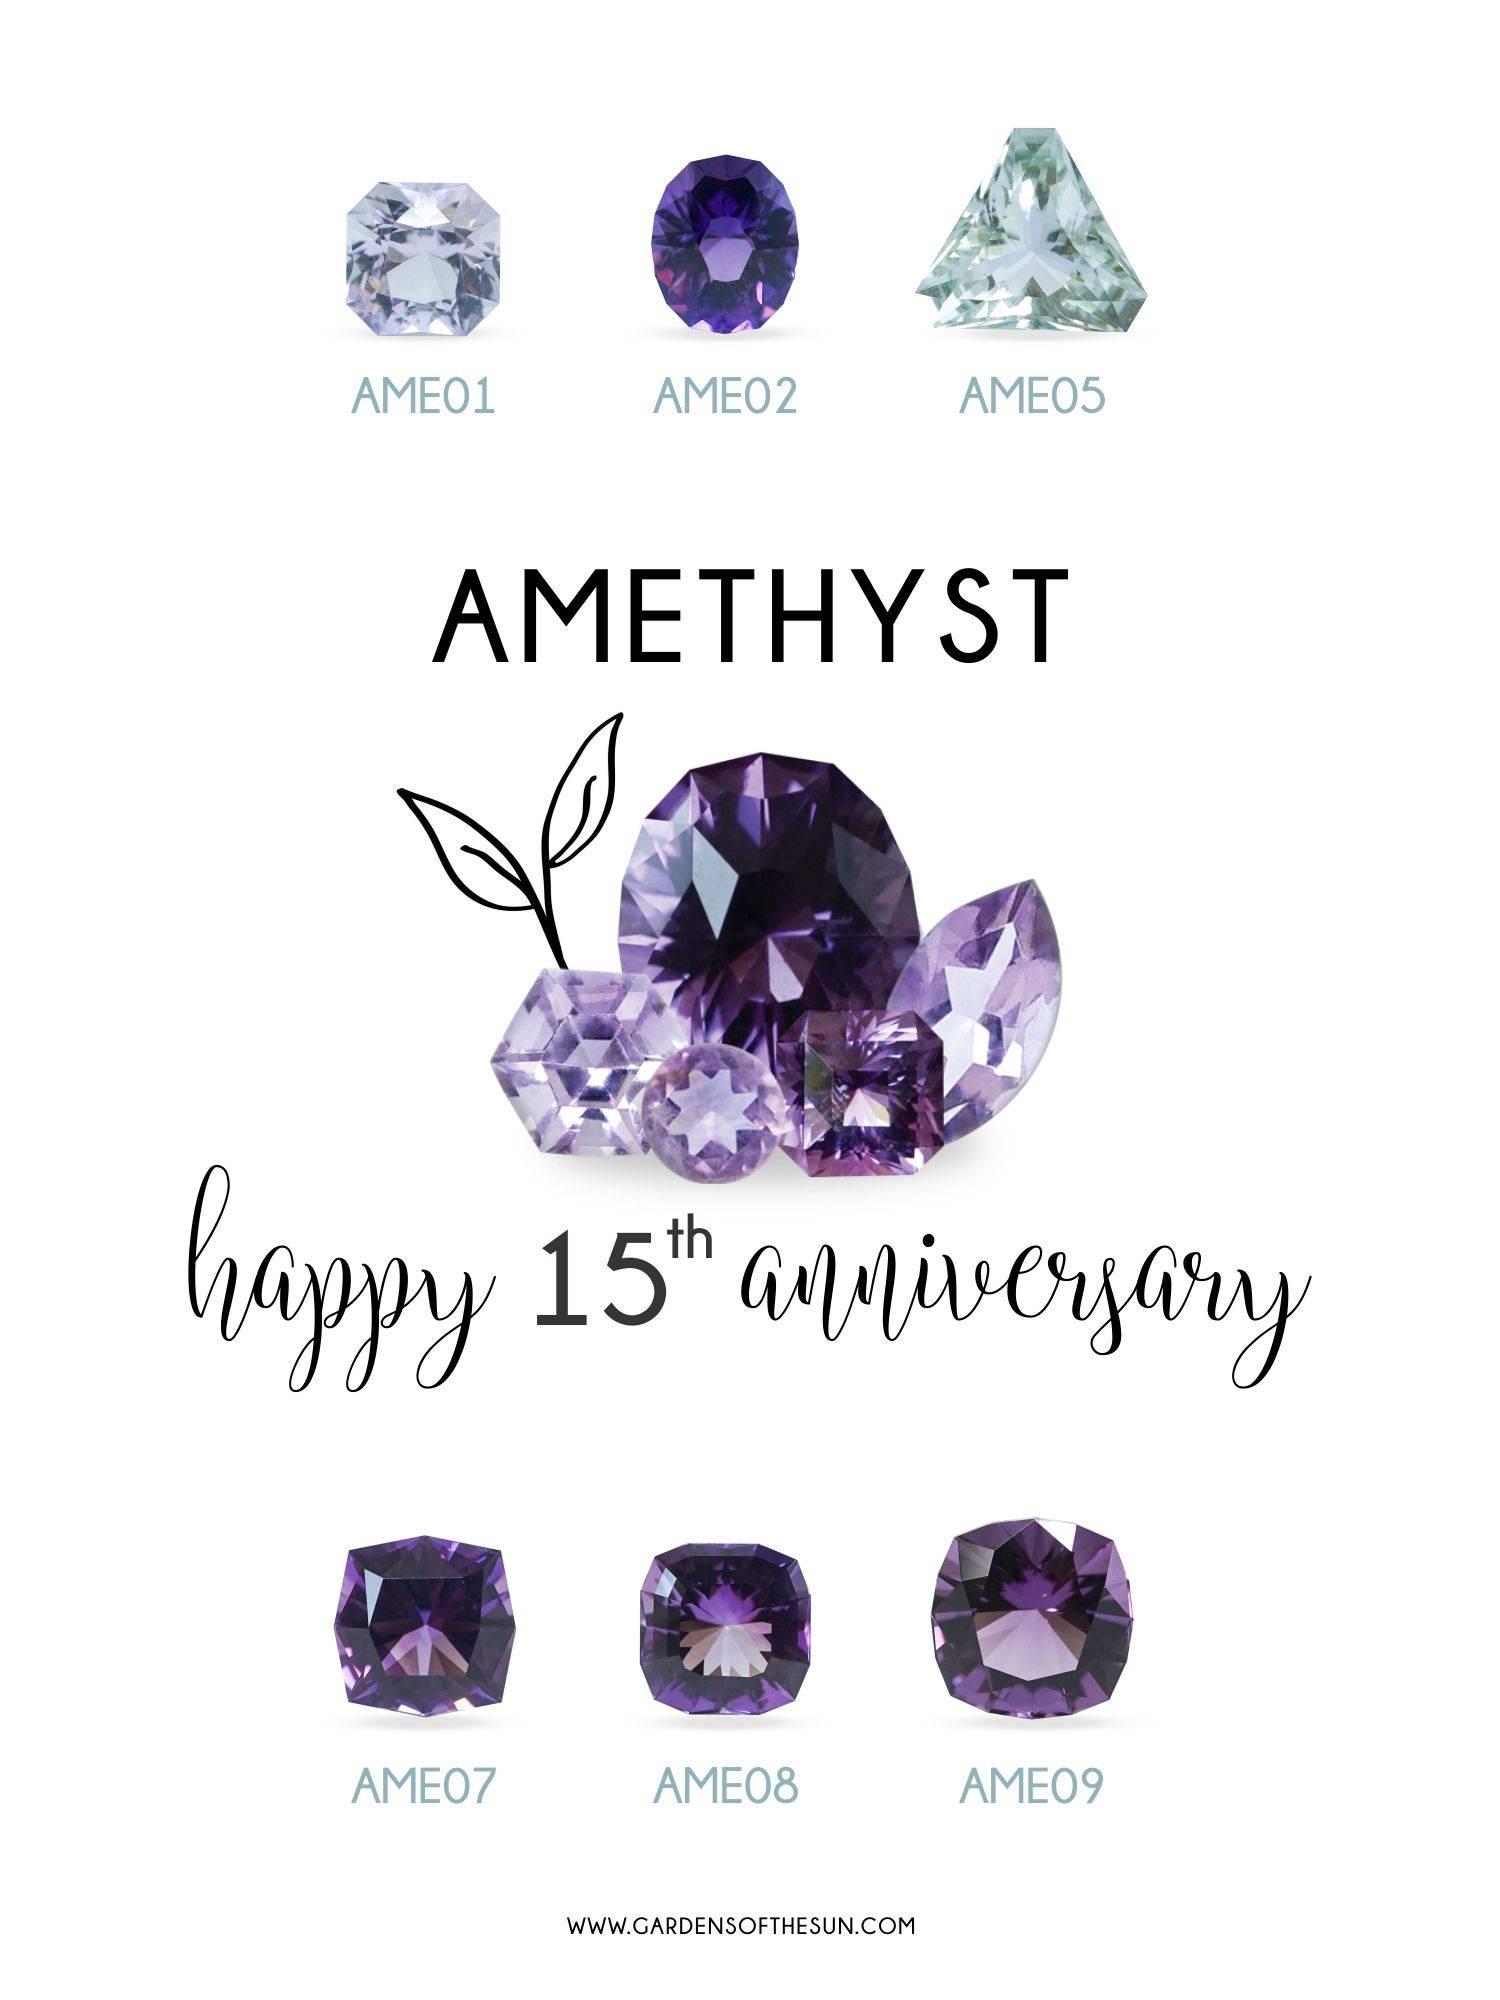 Custom amethyst ethical gold ring